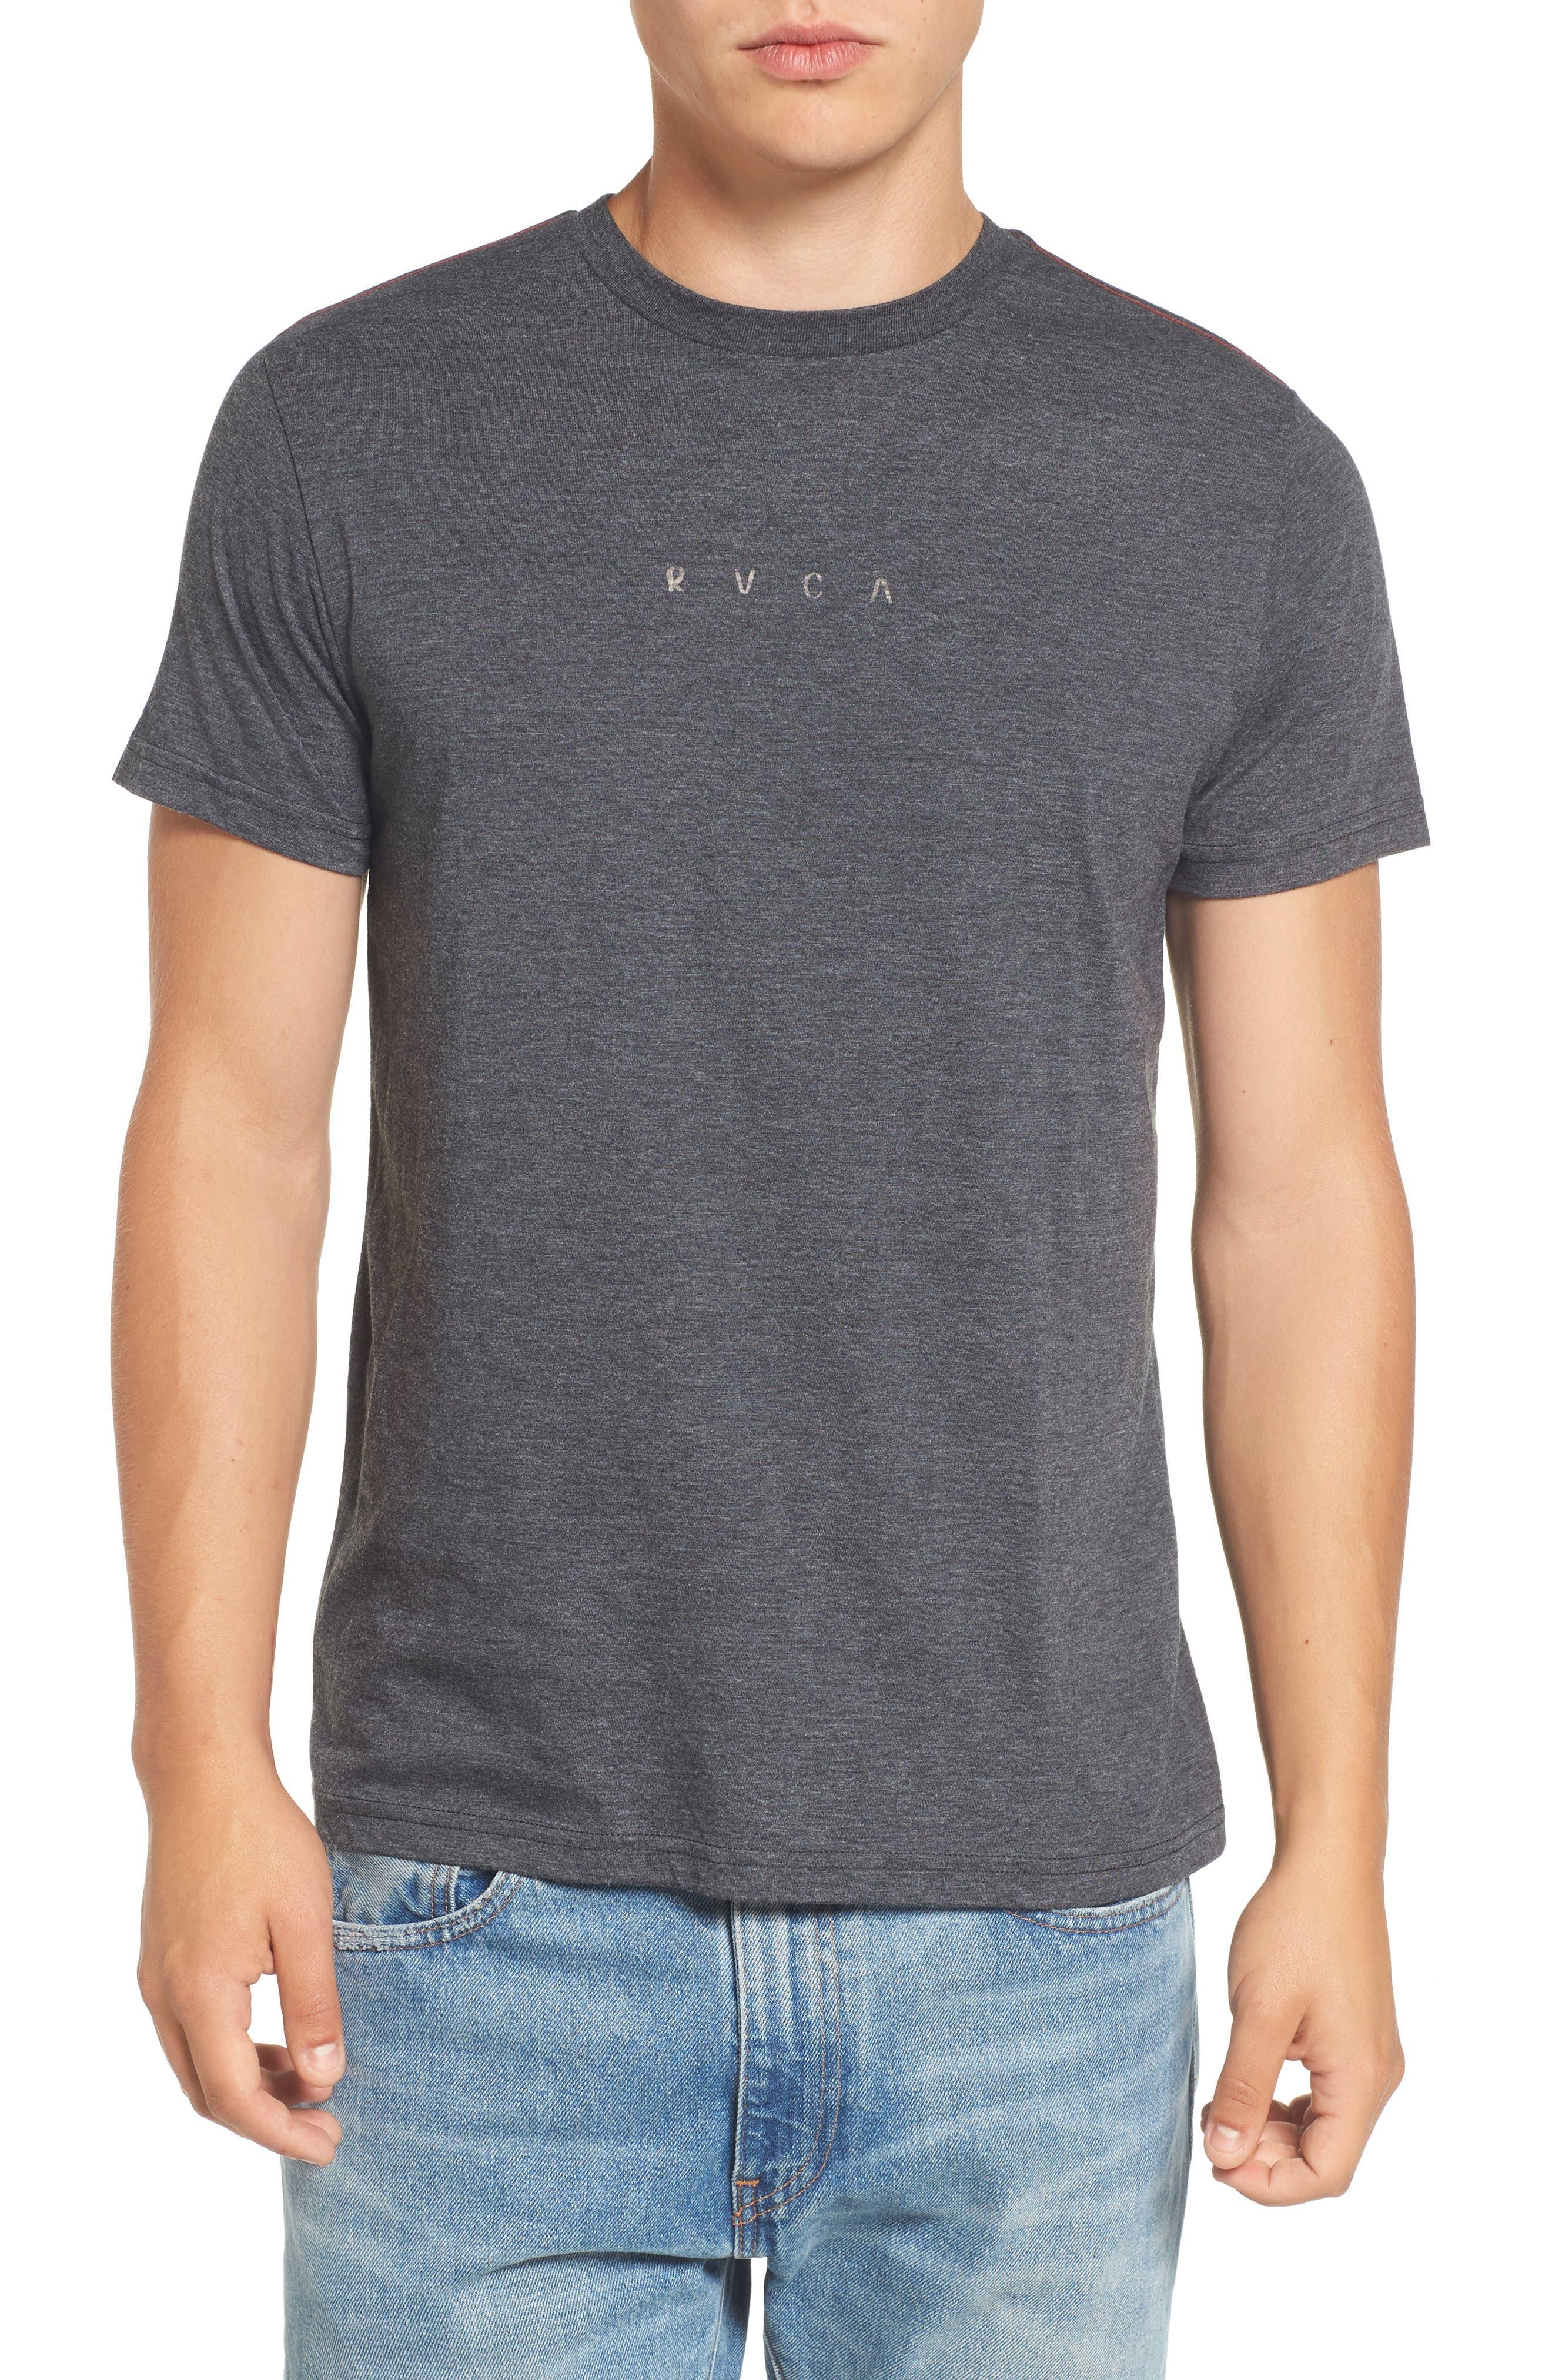 Snooze Cloud Graphic T-Shirt,                             Main thumbnail 1, color,                             001